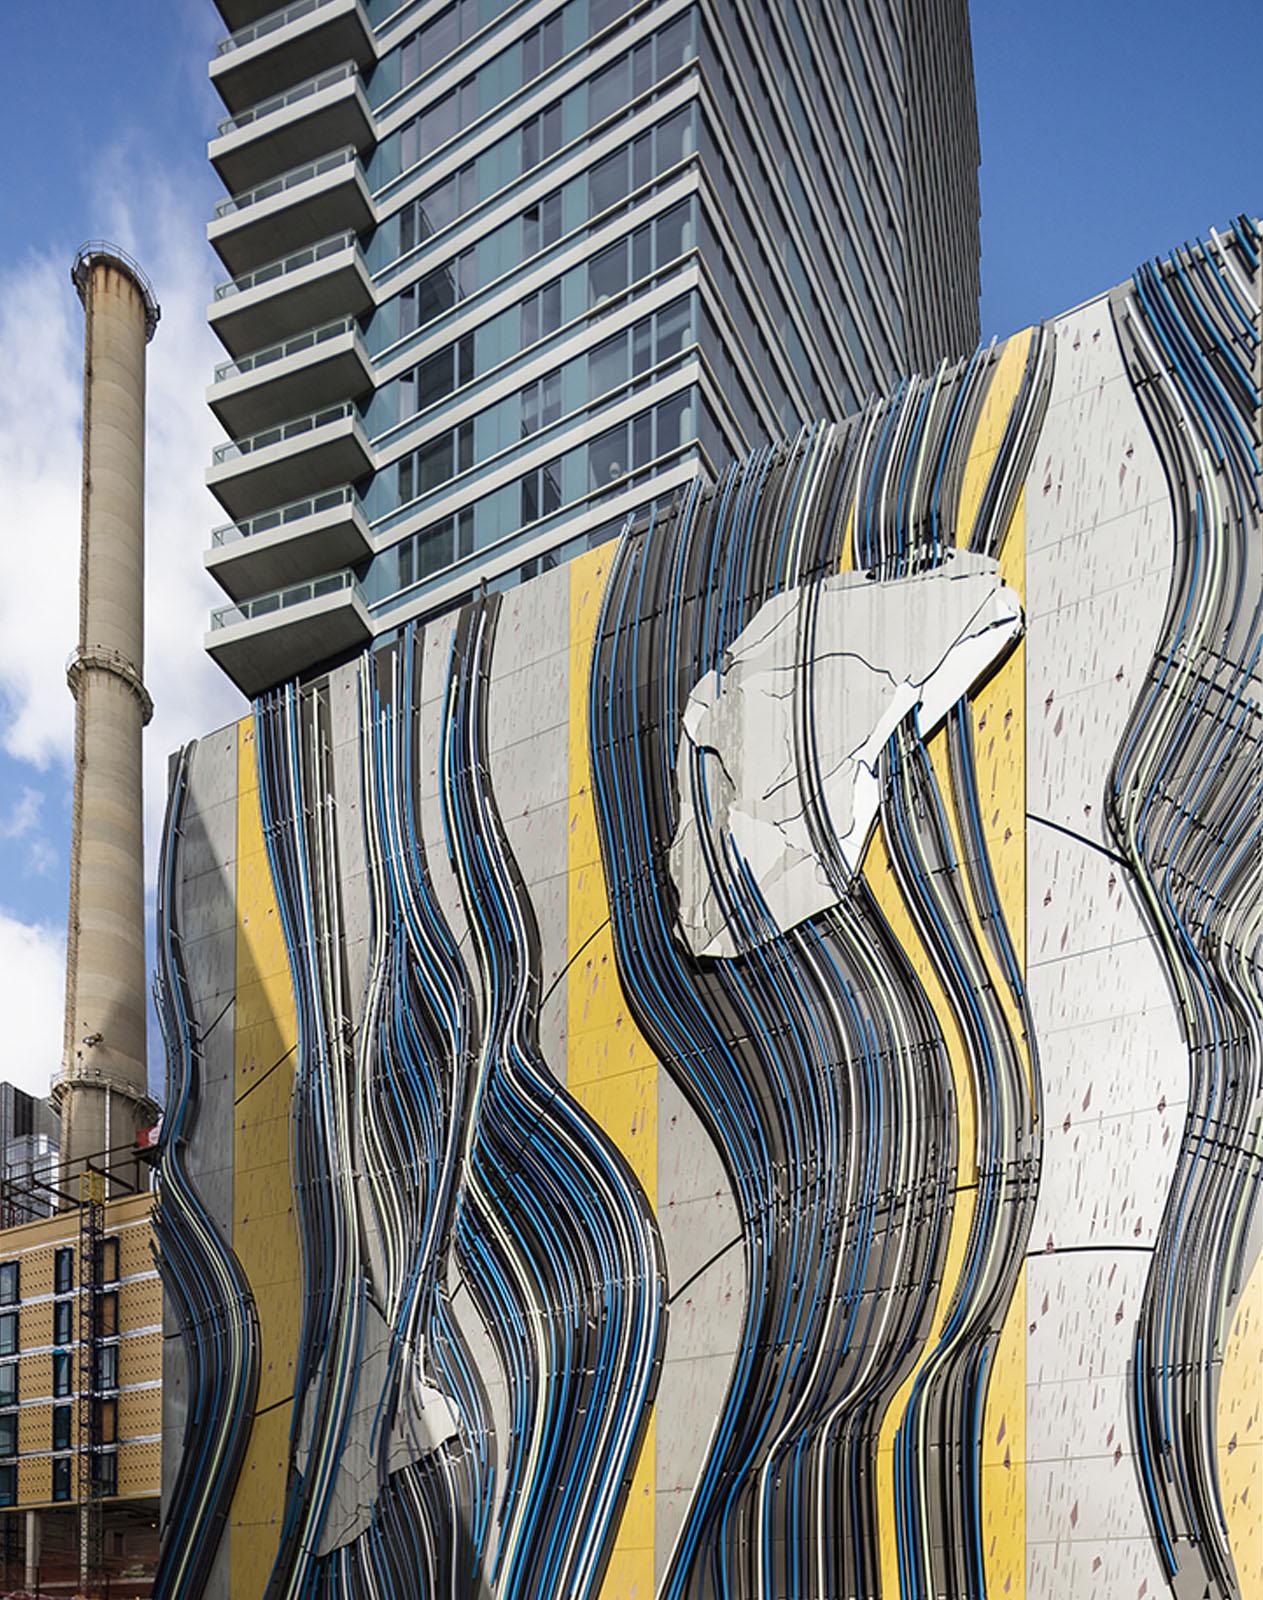 flows-two-ways-stephen-glassman-studio-durst-bjarke-ingels-via-revista-mexico-design-2